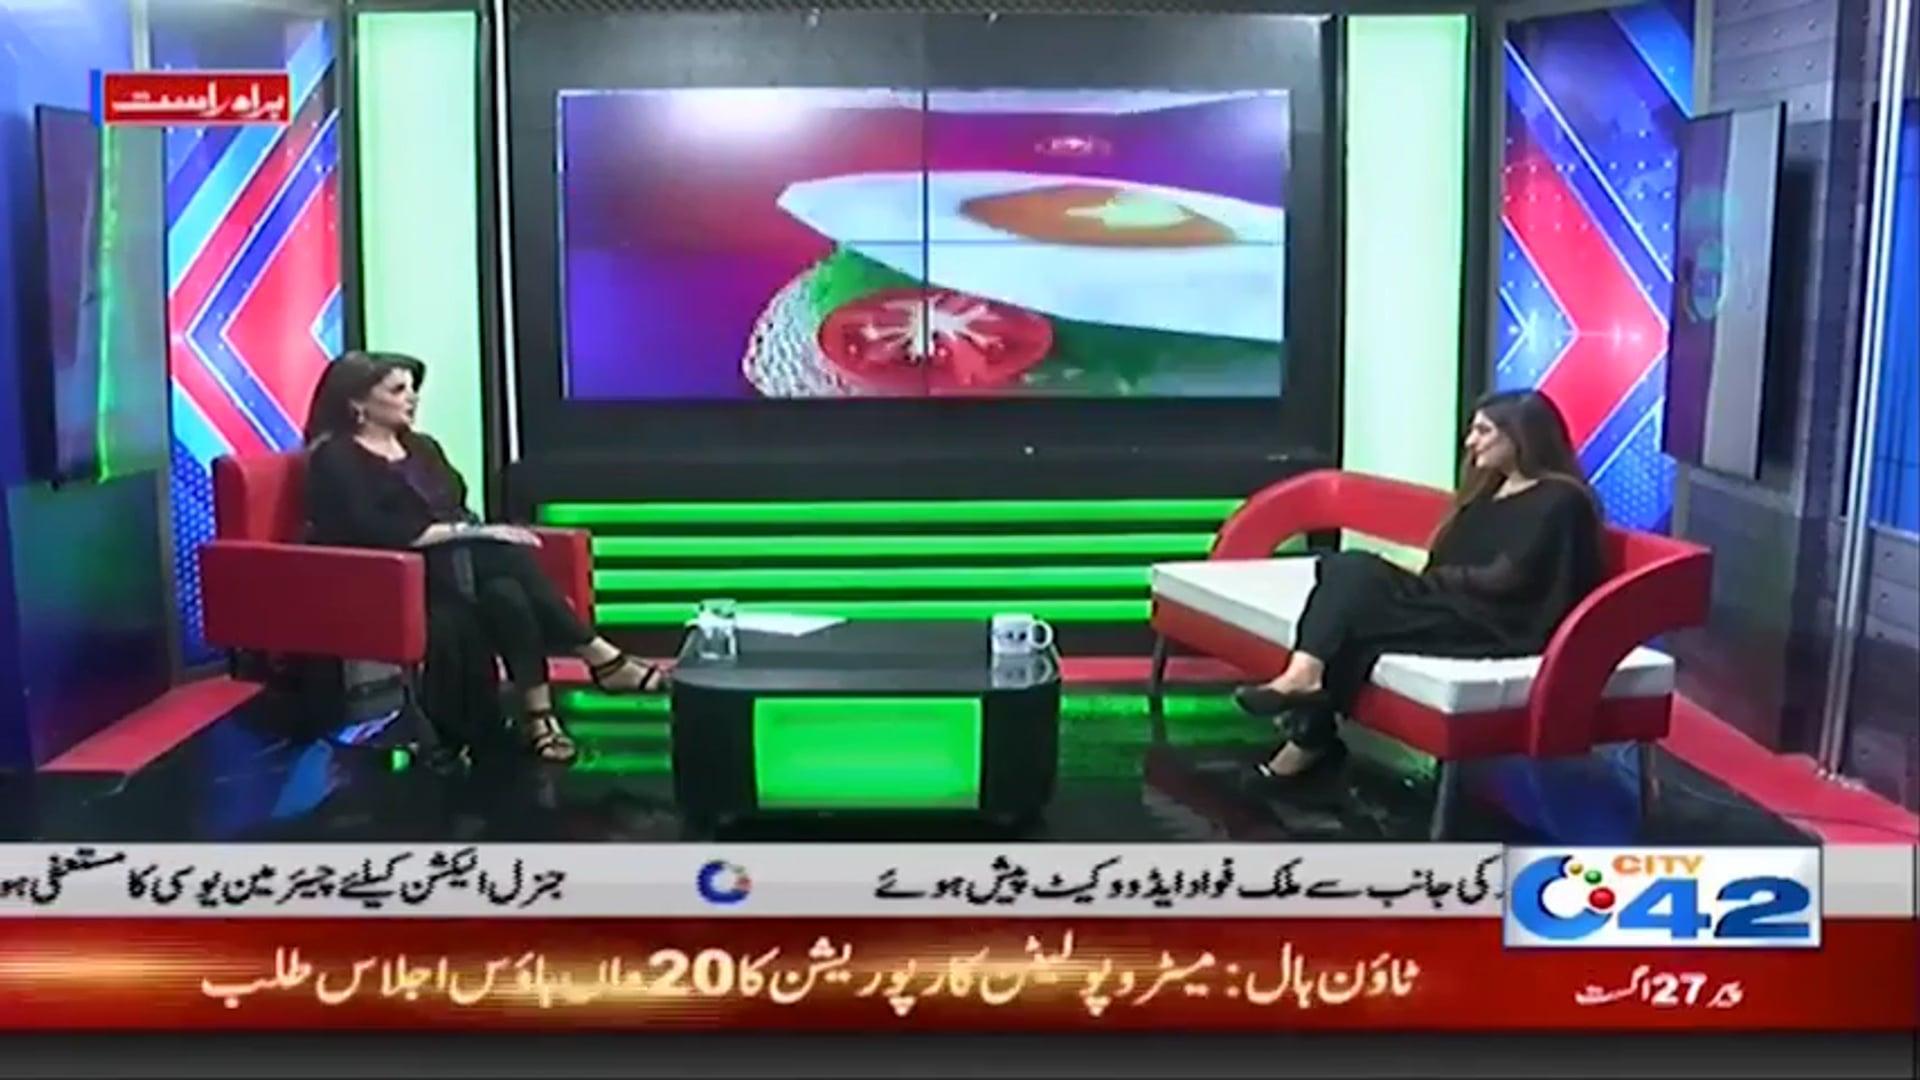 Soraya Sikander TV Interview on City42 channel